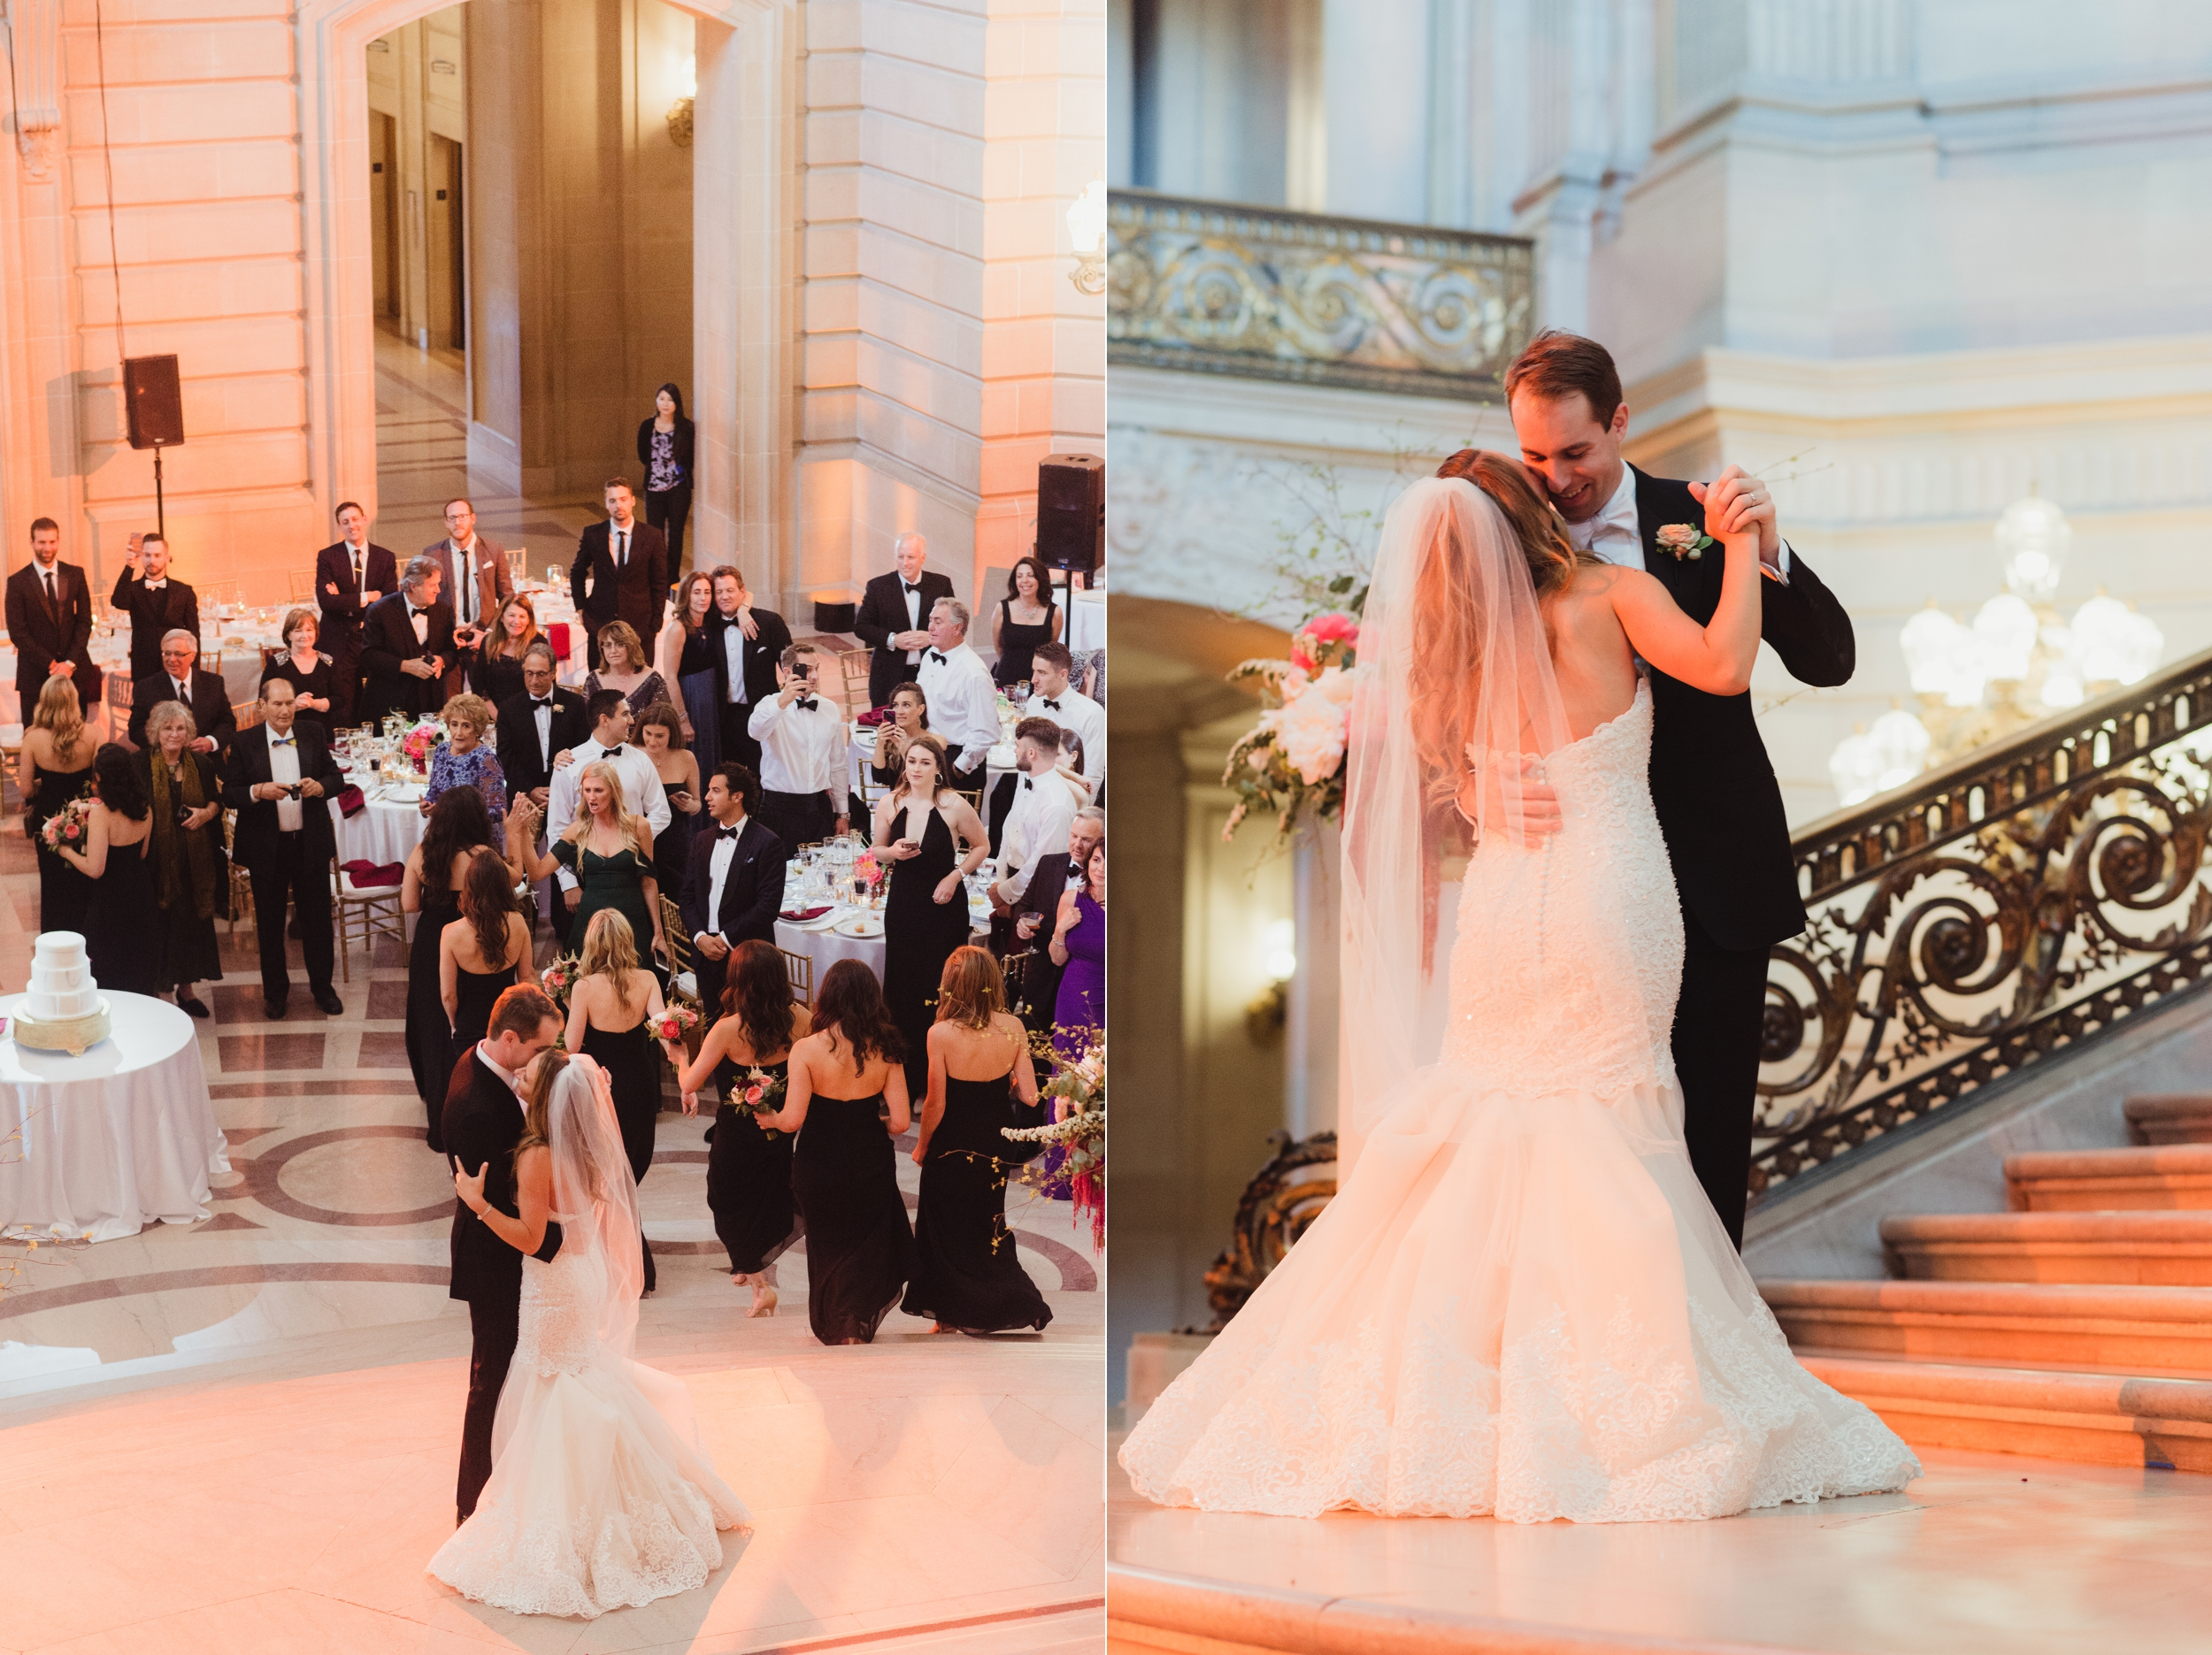 74-elegant-san-francisco-city-hall-wedding-vivianchen-0828_WEB.jpg